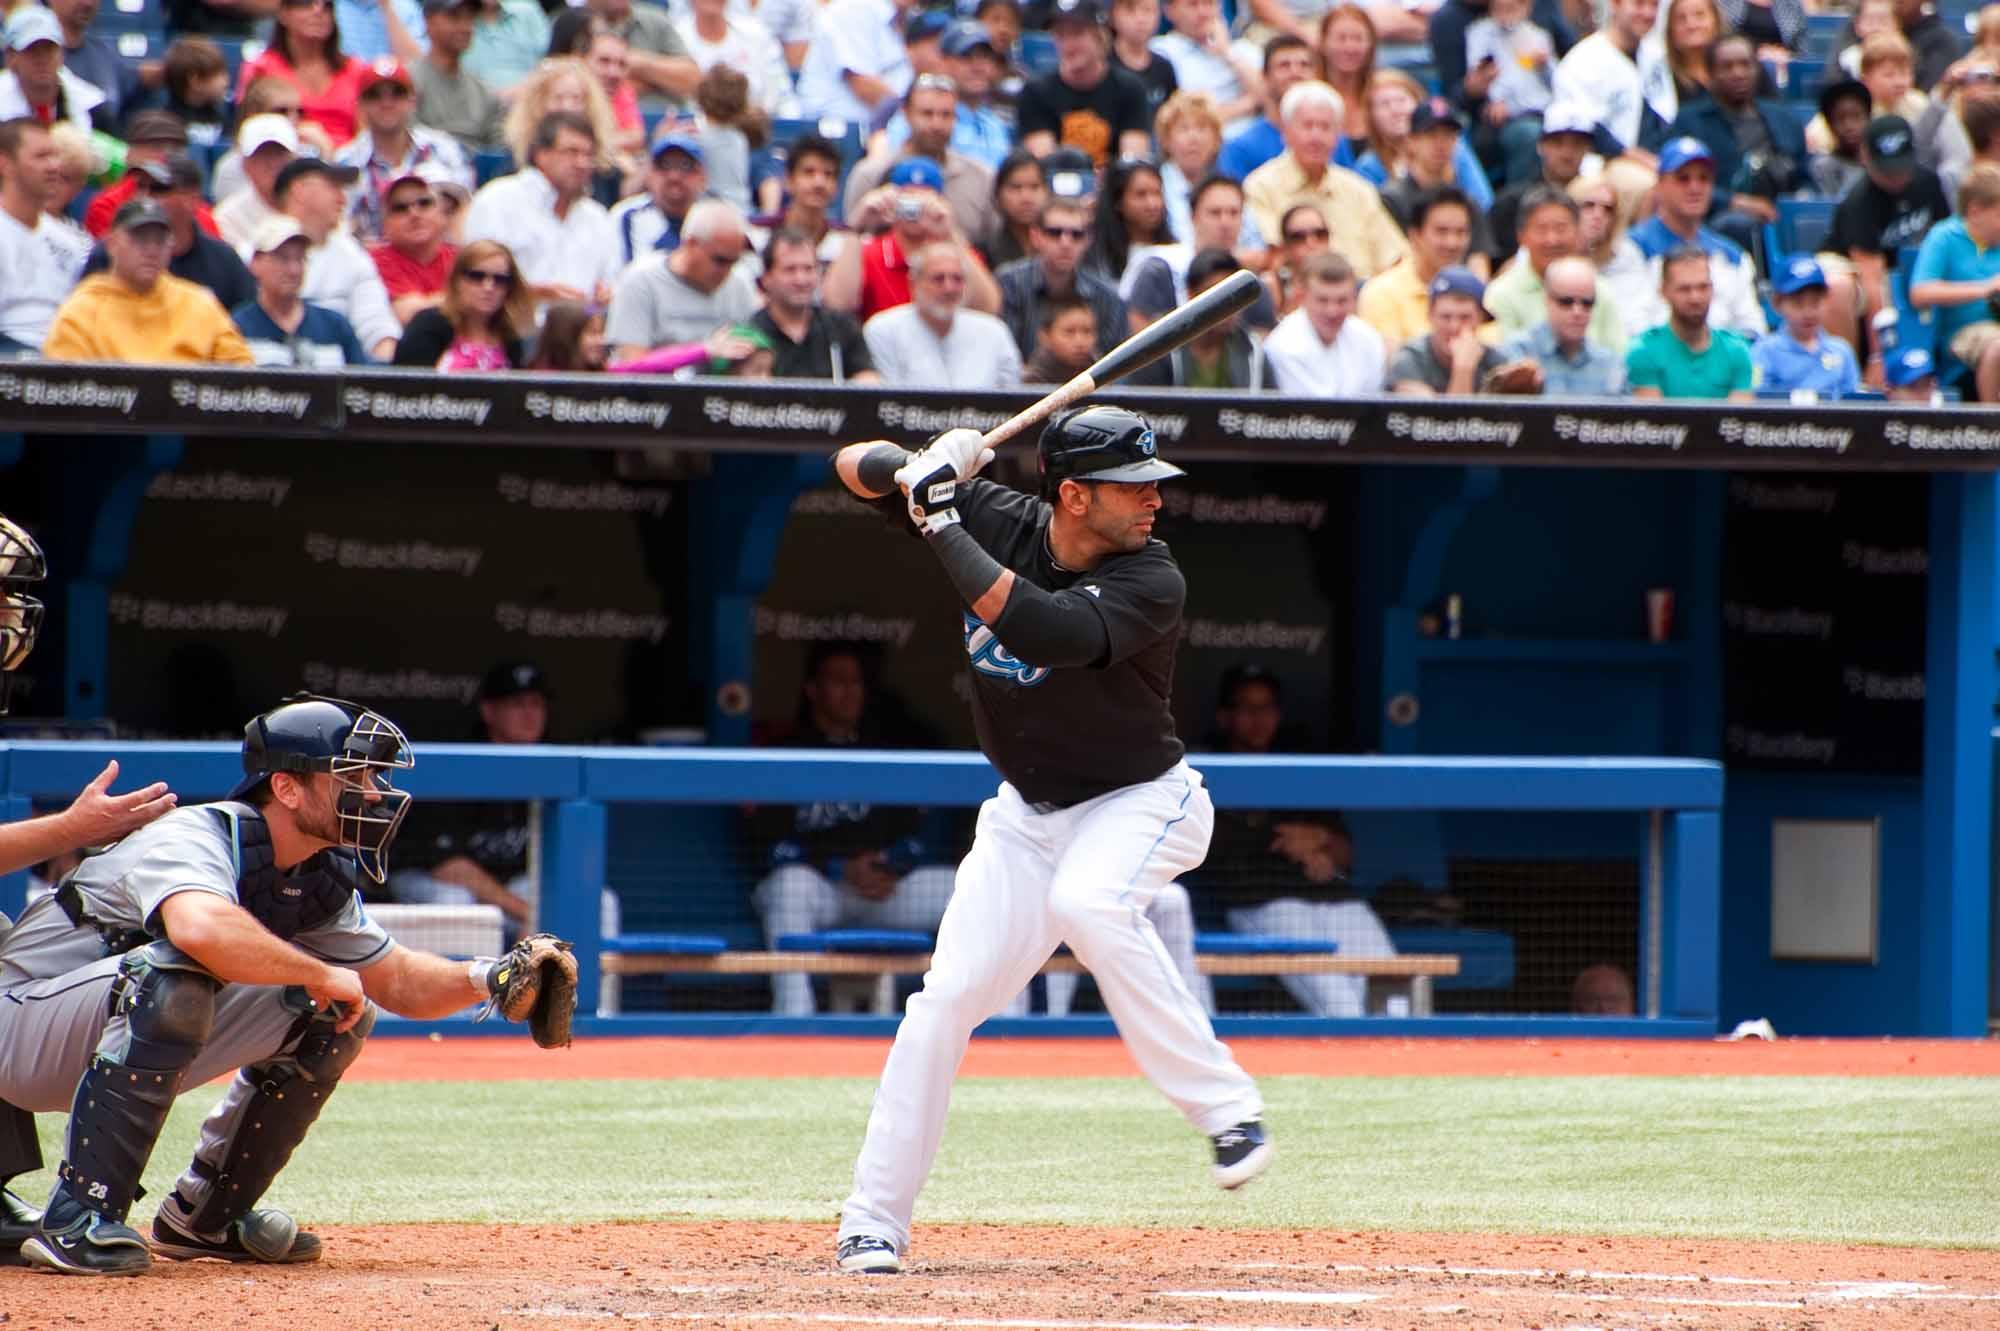 Jose Bautista of the Toronto Blue Jays